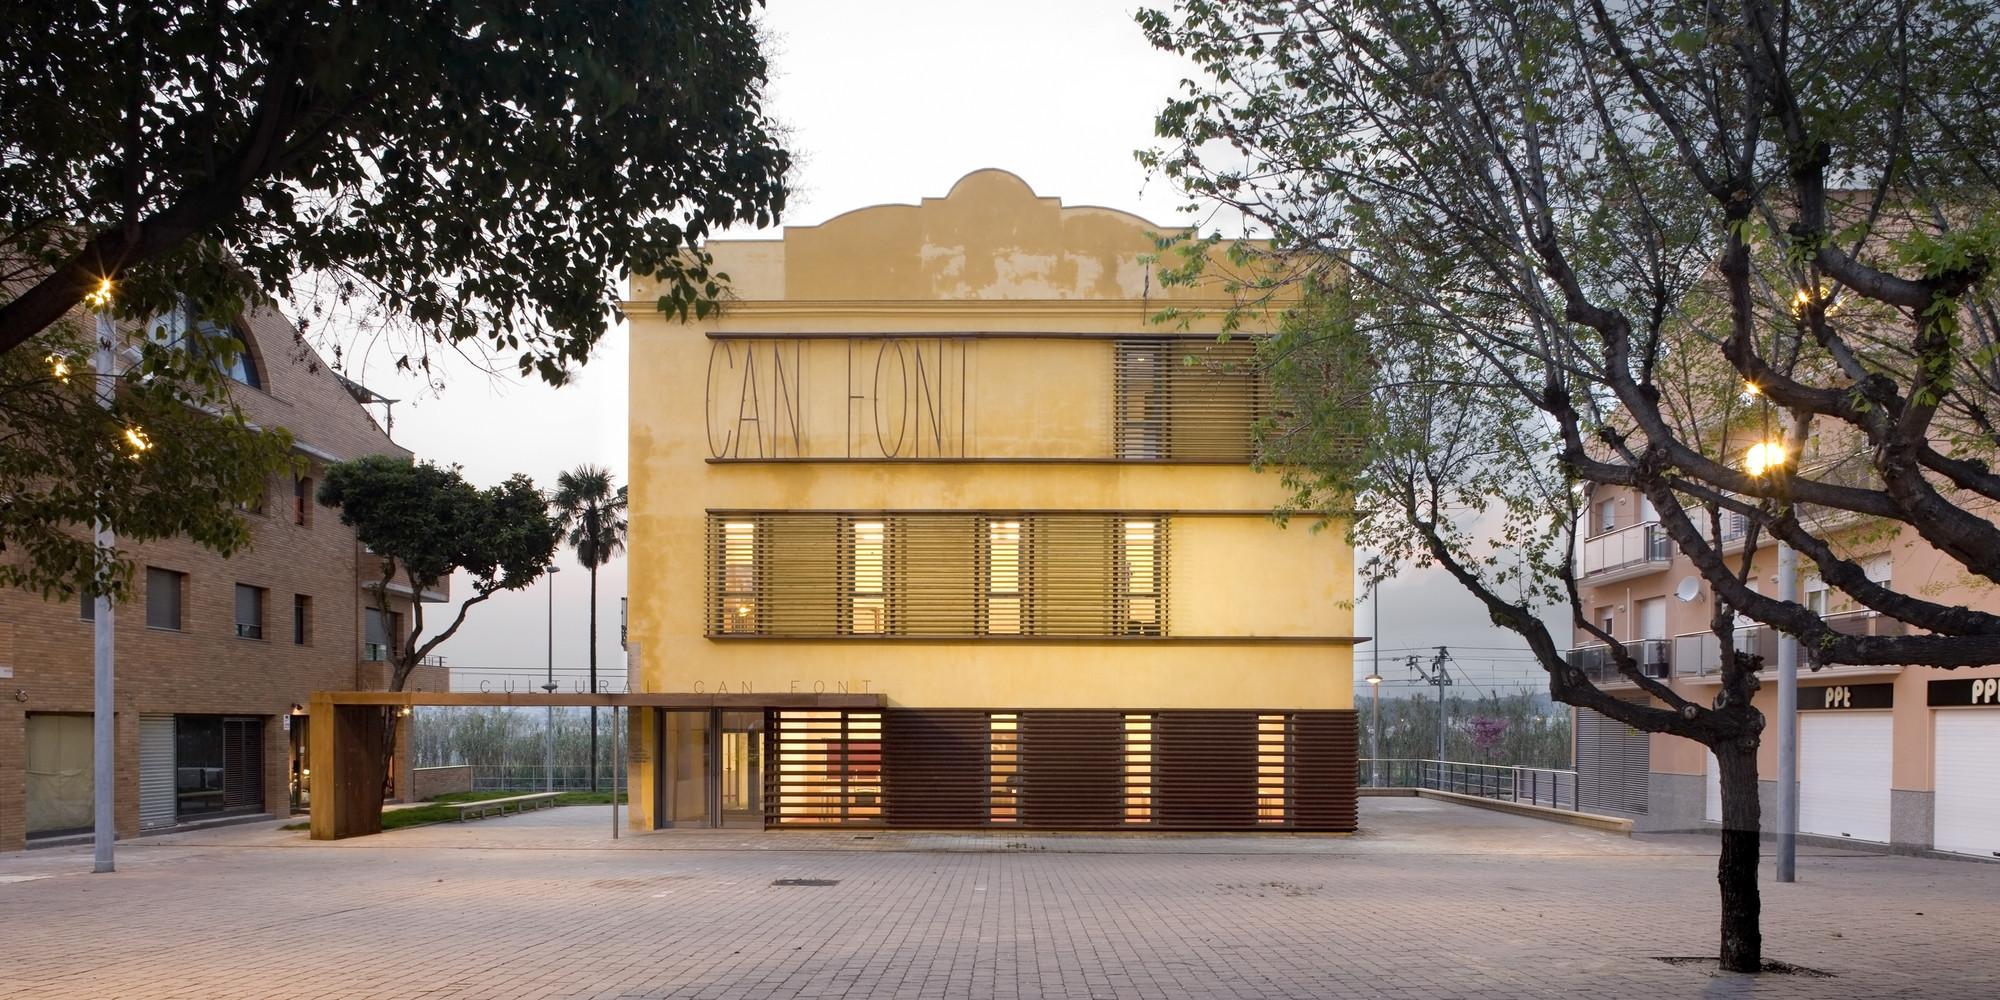 Can Font Cultural Center / taller 9s arquitectes, © Adrià Goula